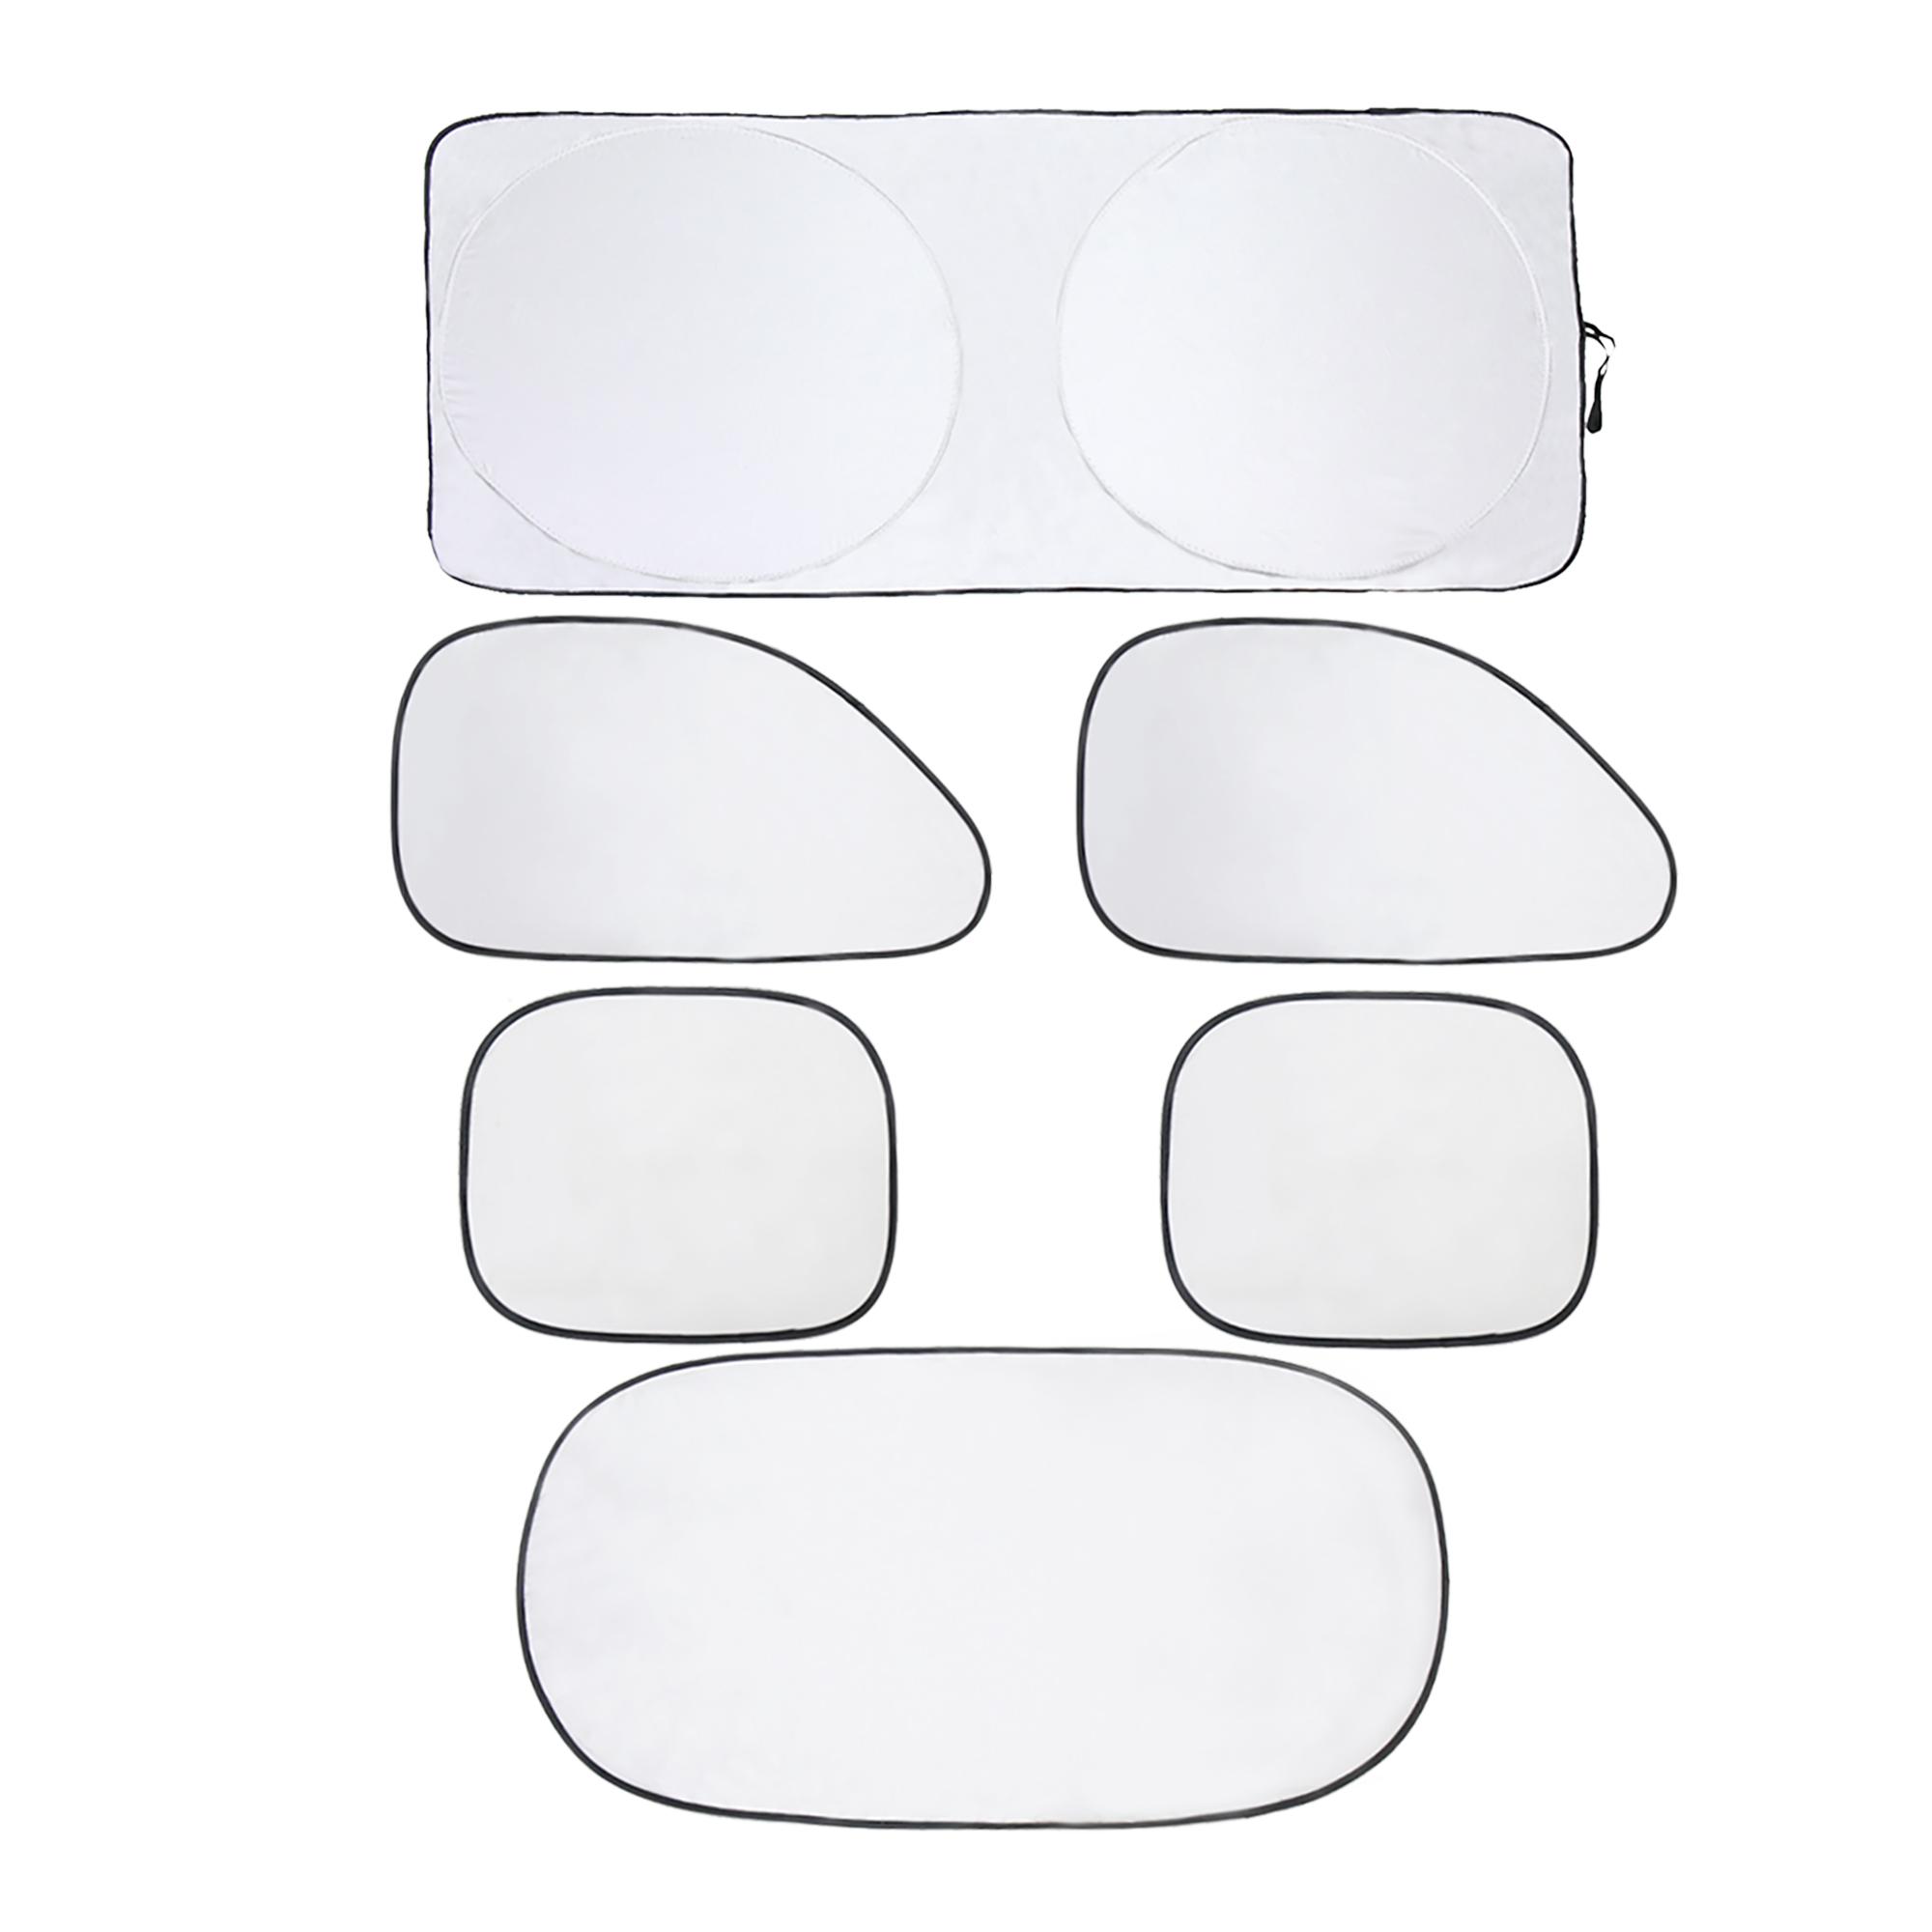 6 Pcs Foldable Silver Tone Car Sun Shade UV Rays Full Protection Universal